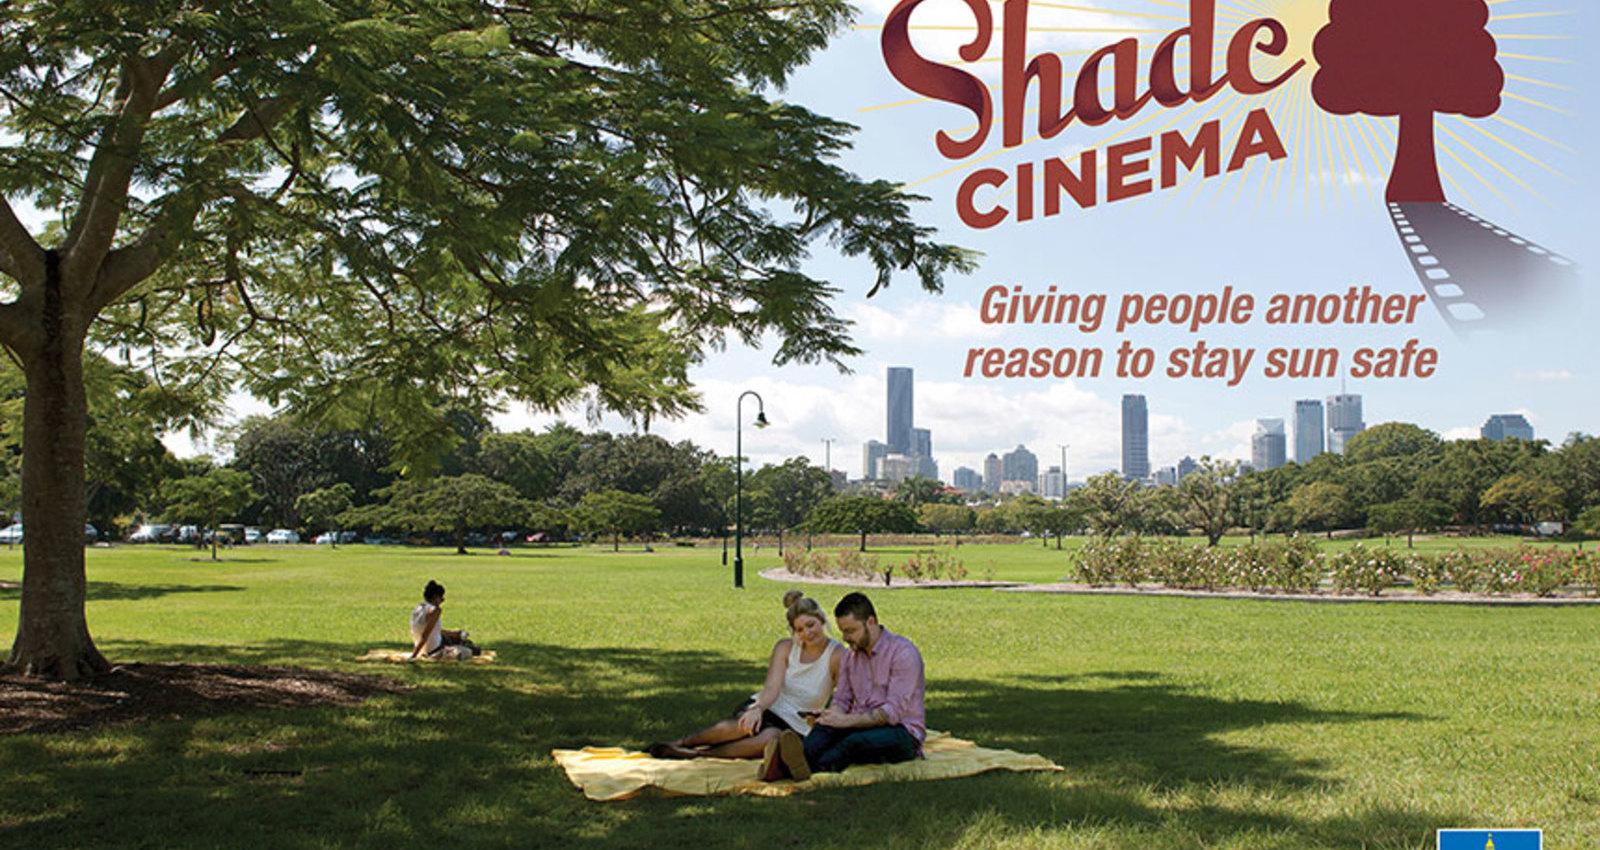 Shade Cinema